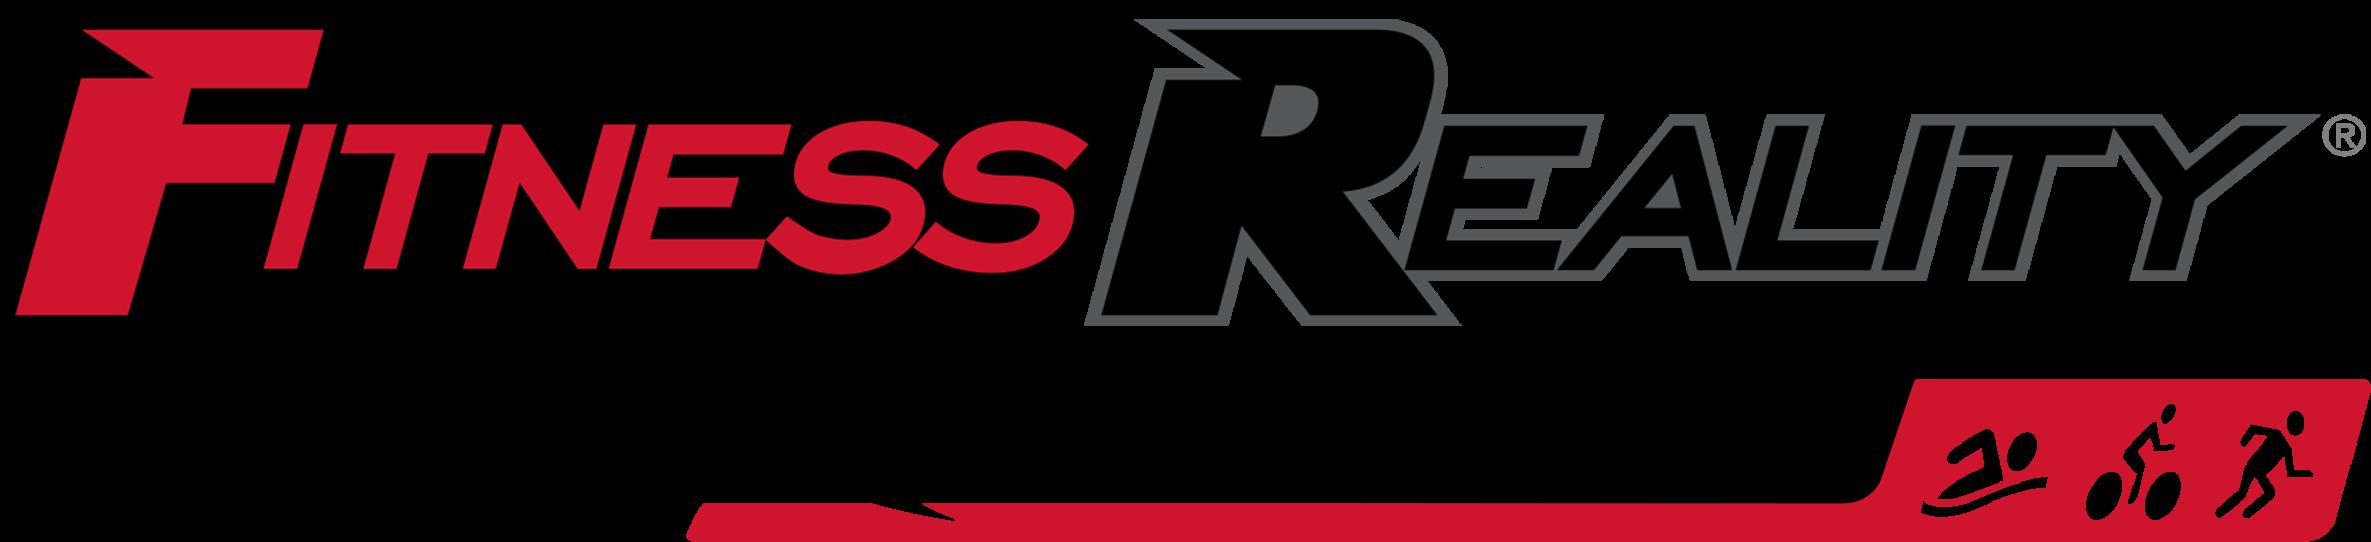 fr-logo-x-class-logo-plain.png